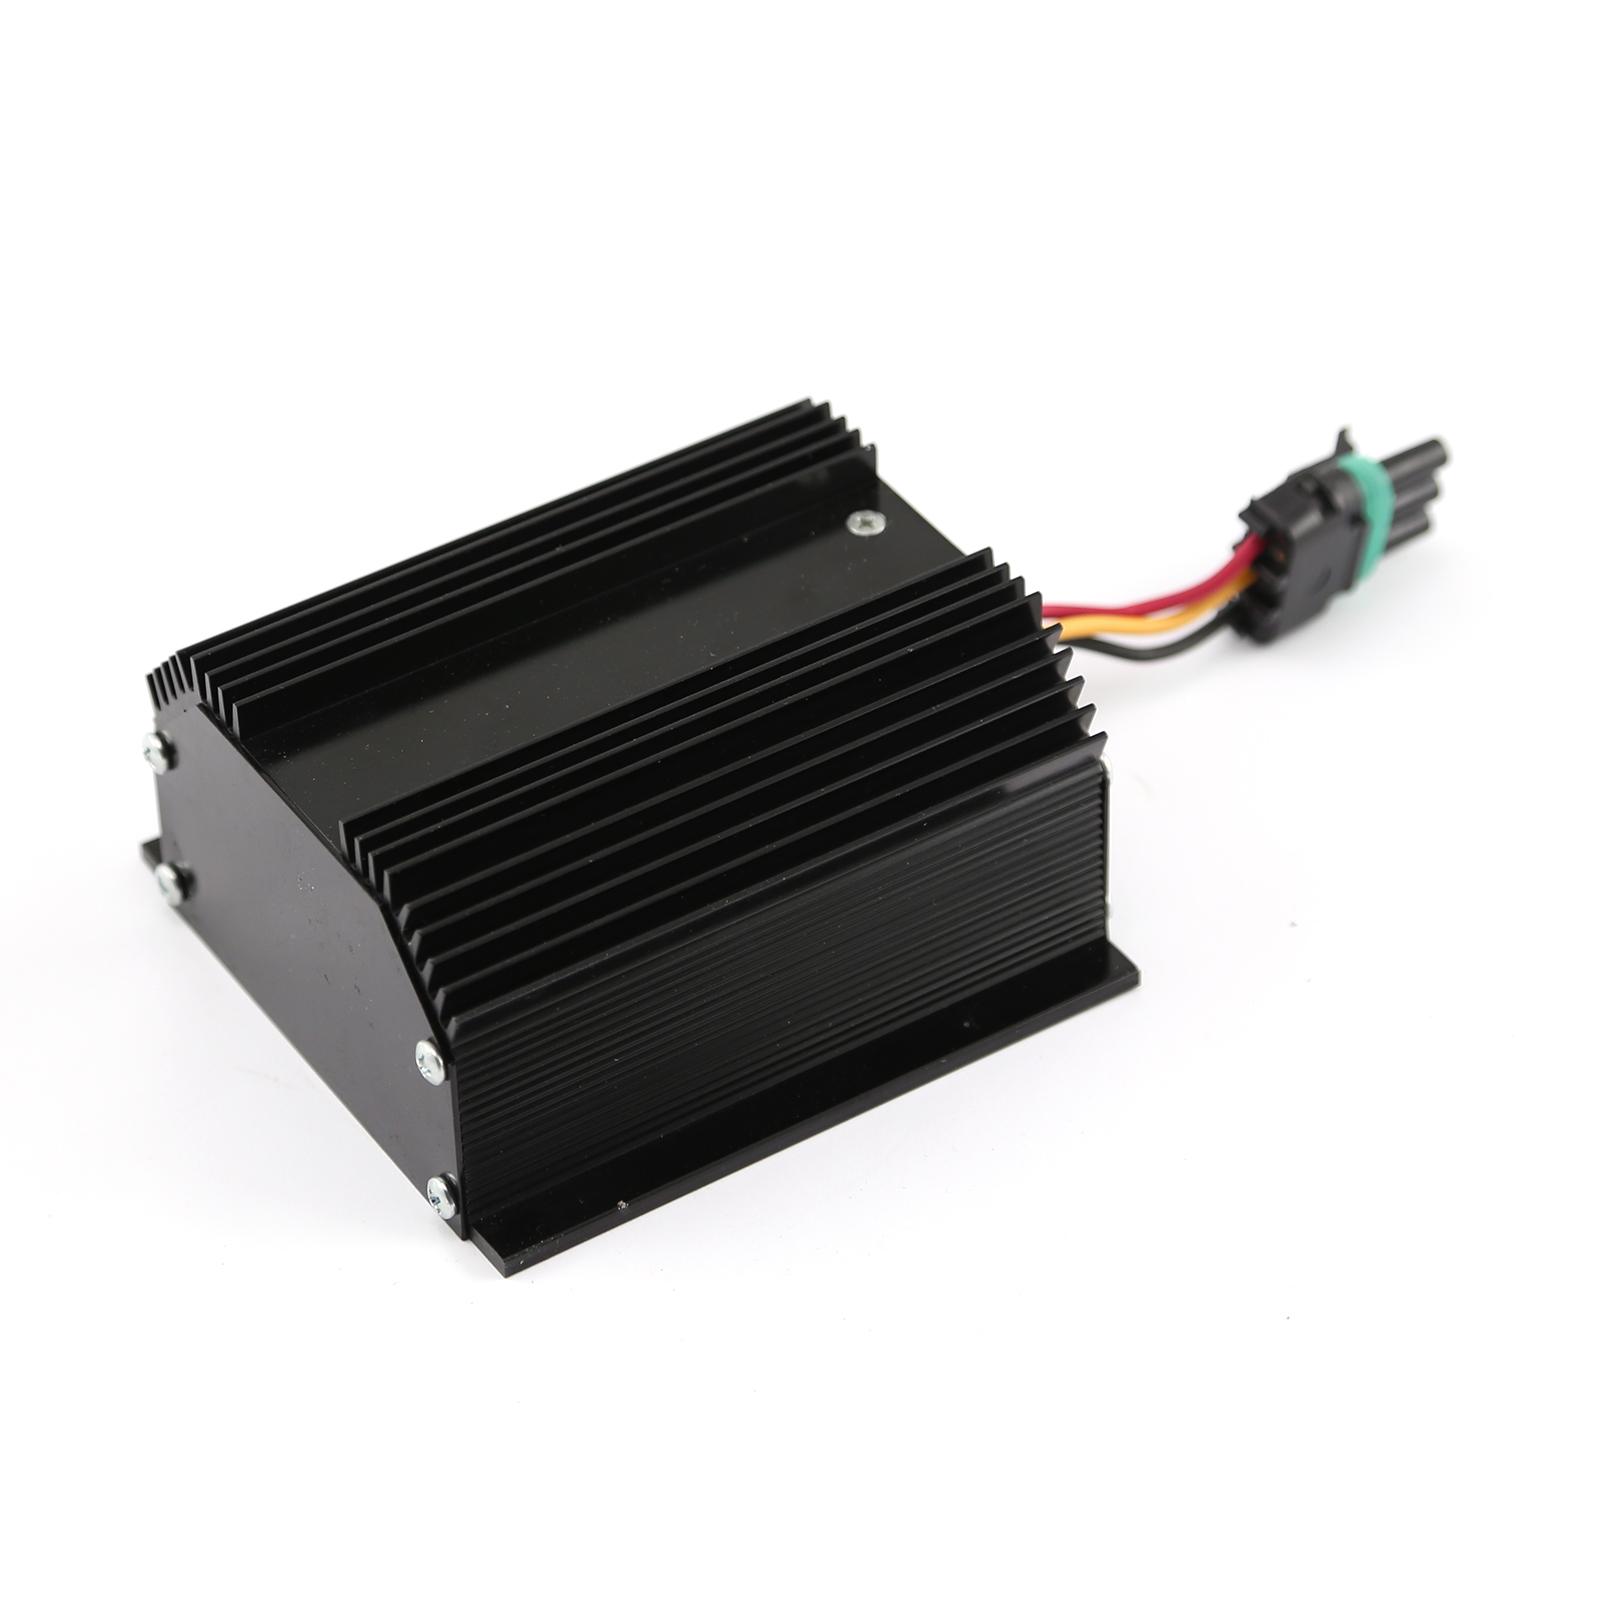 Ignition / Fuel Pump Voltage Booster 1.5 - 18 Volt